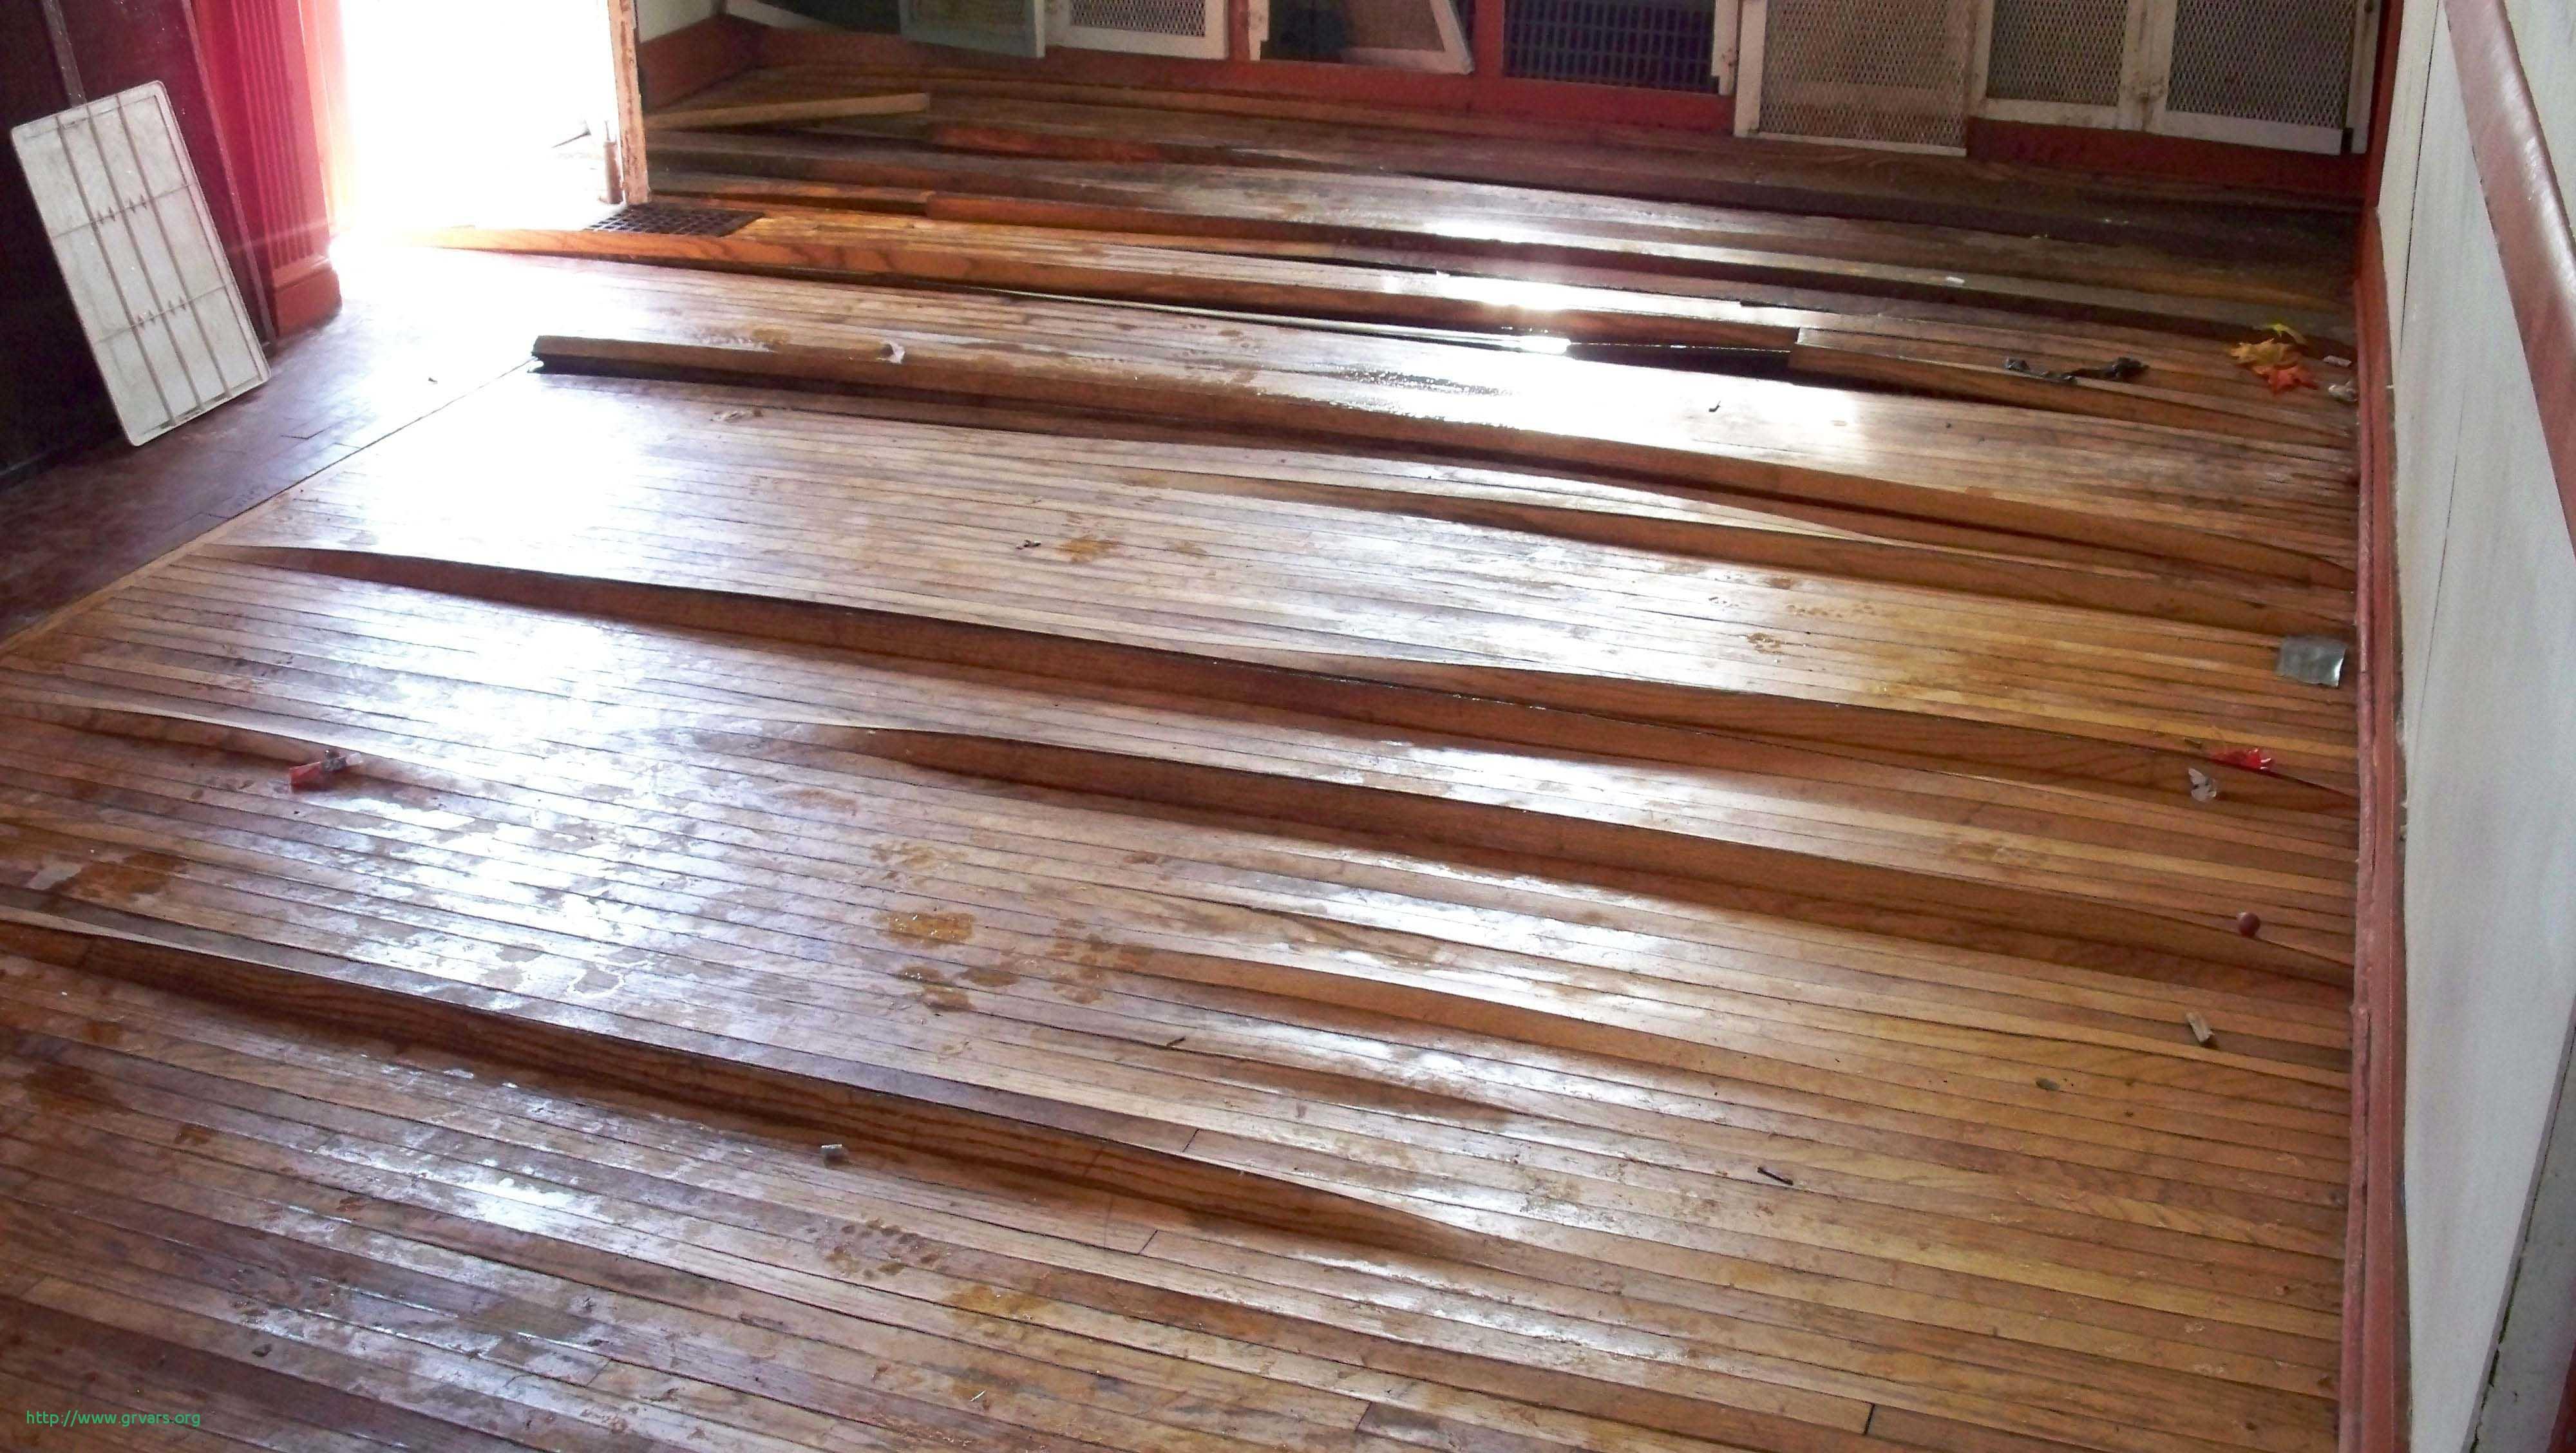 hardwood floor cleaning new york of 24 impressionnant most affordable hardwood floors ideas blog inside hardwood floor water damage warping